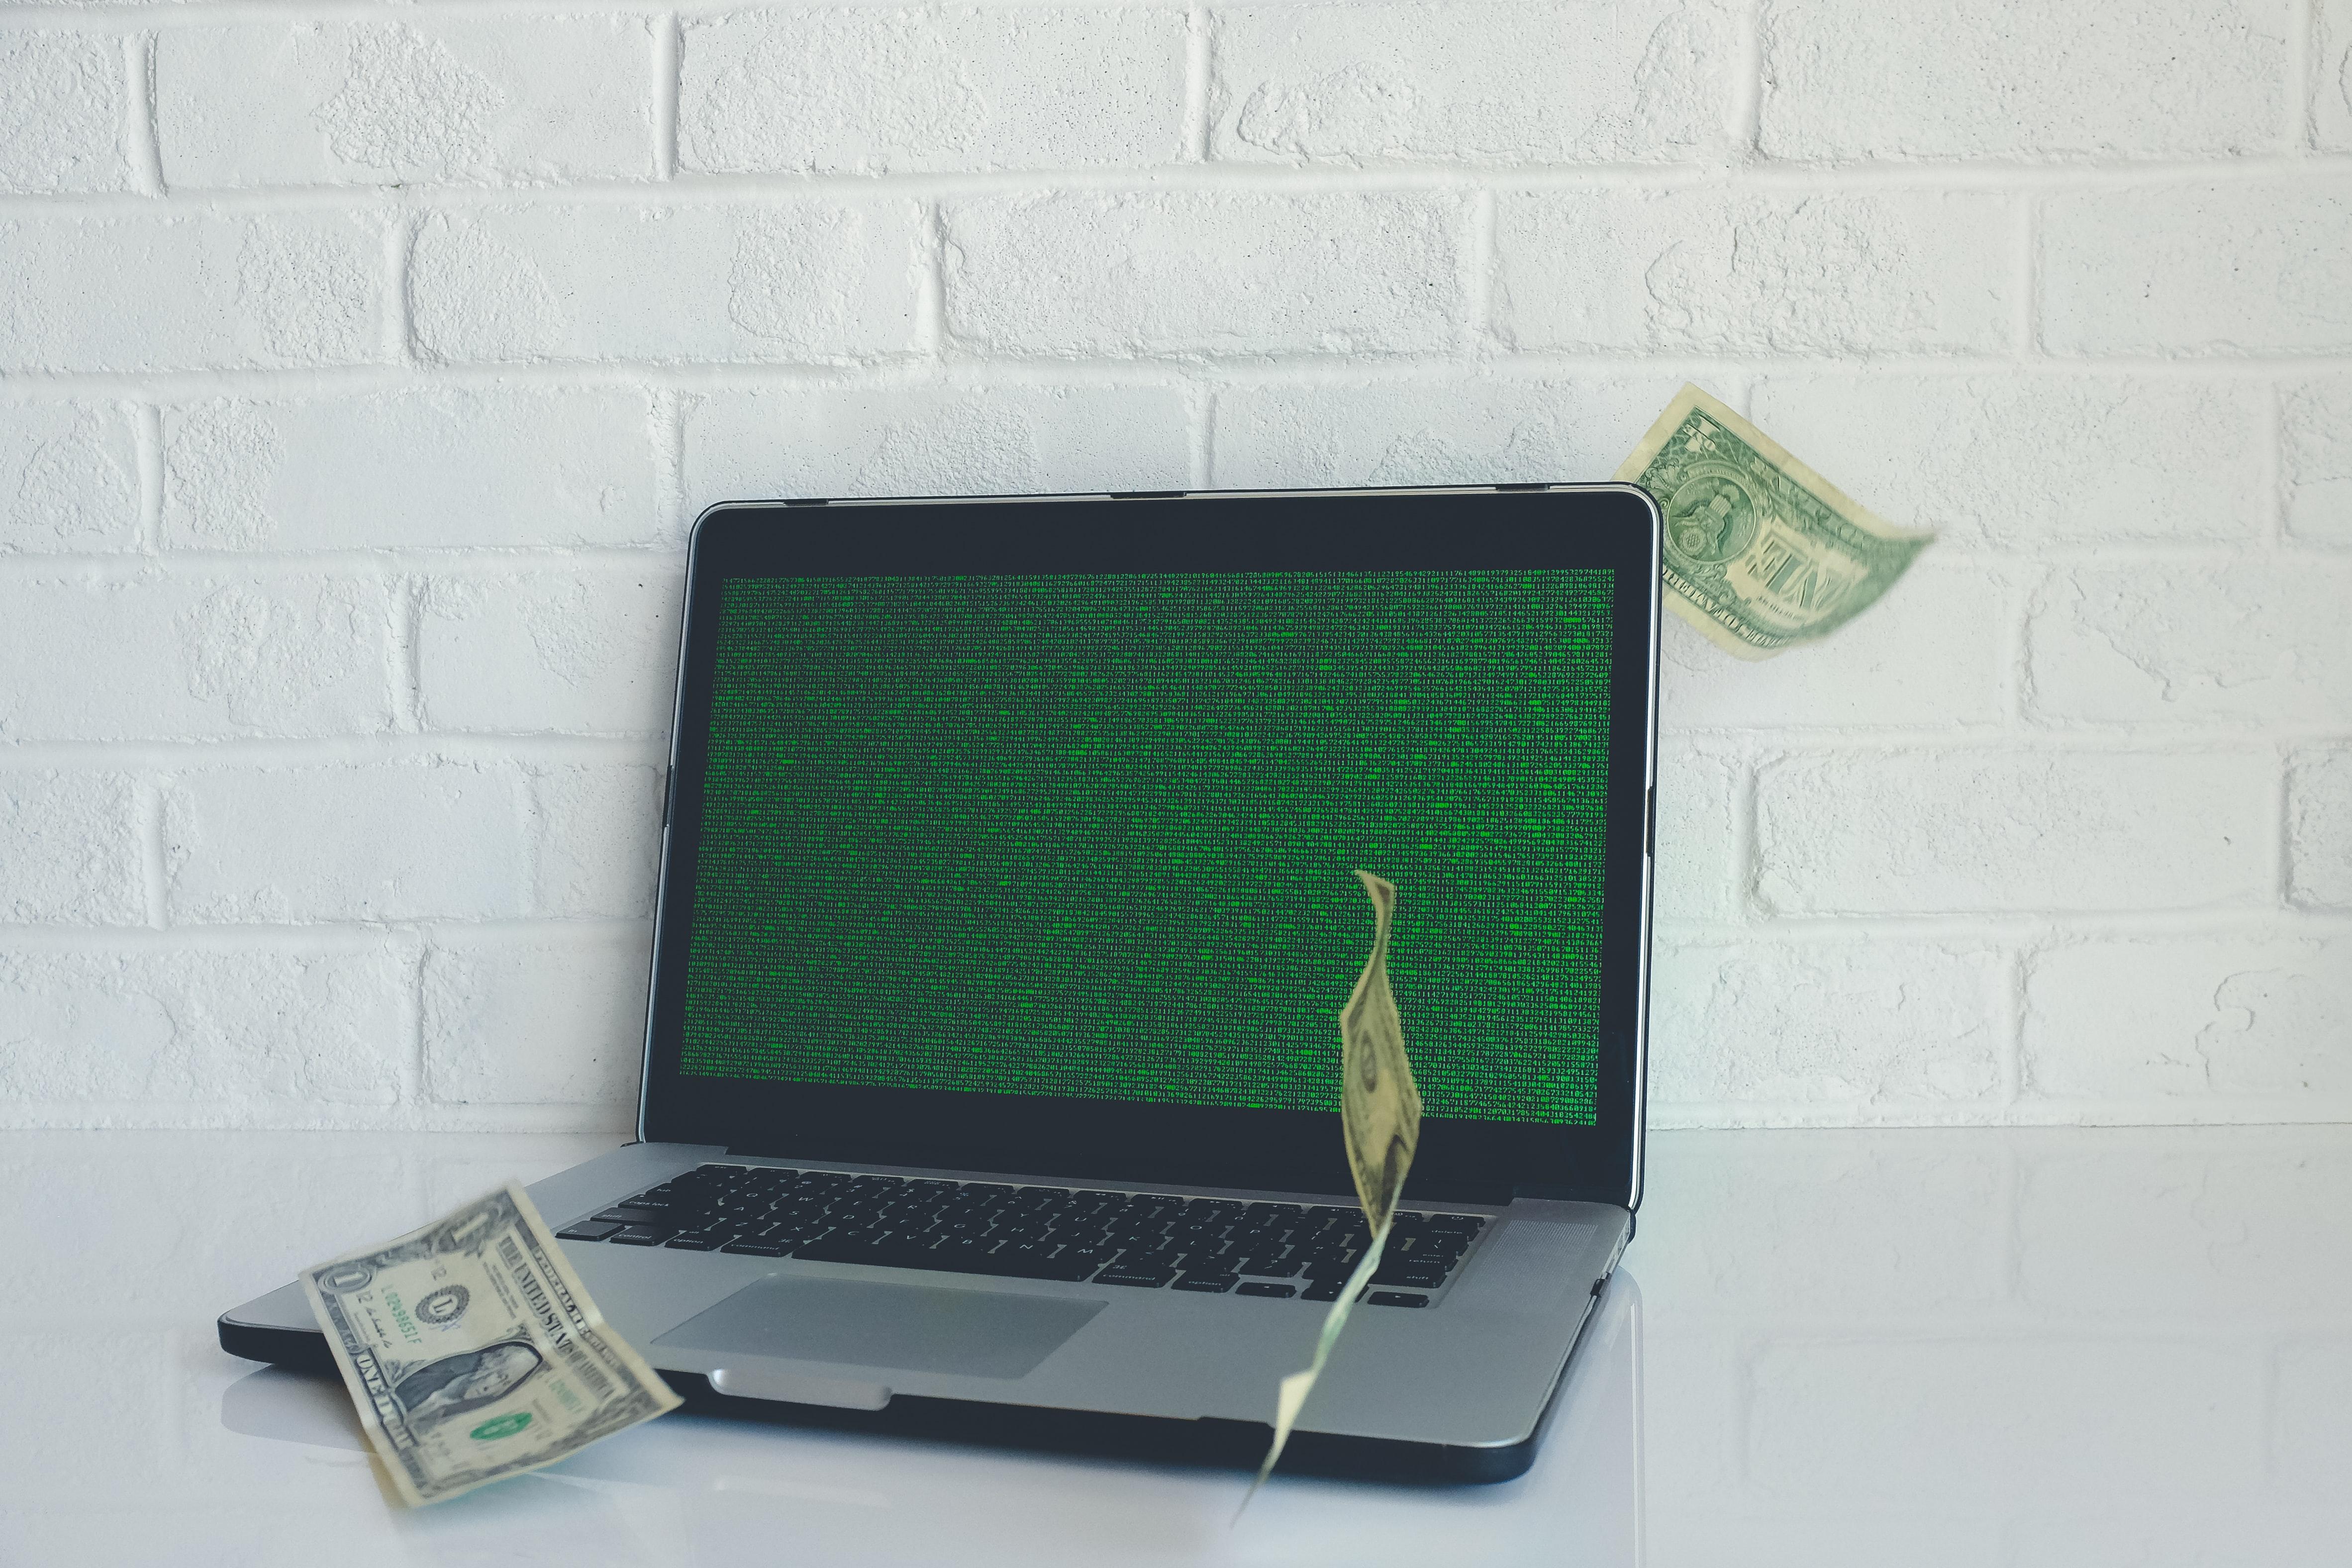 A macbook pro laptop with dollar bills falling on it